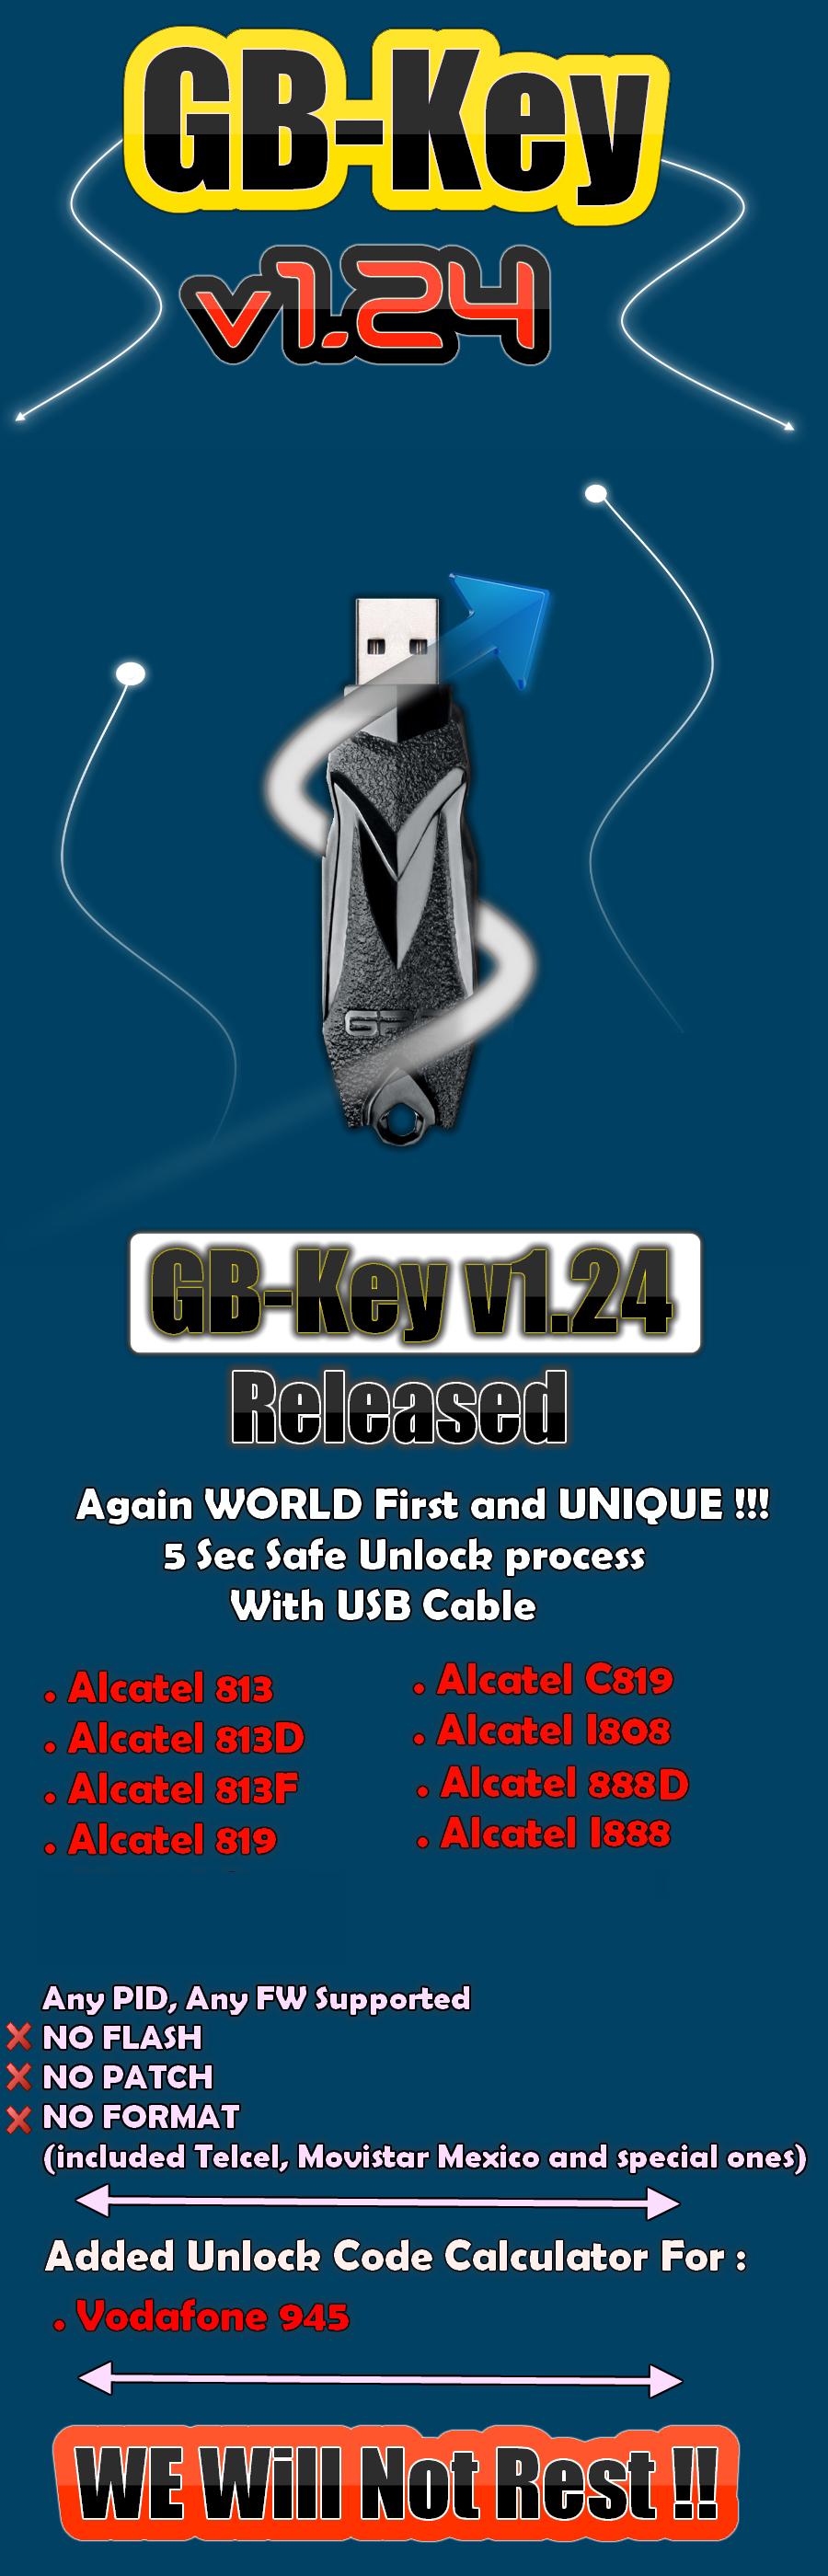 GB-Key 1.24 Released, Alcatel, vodafone